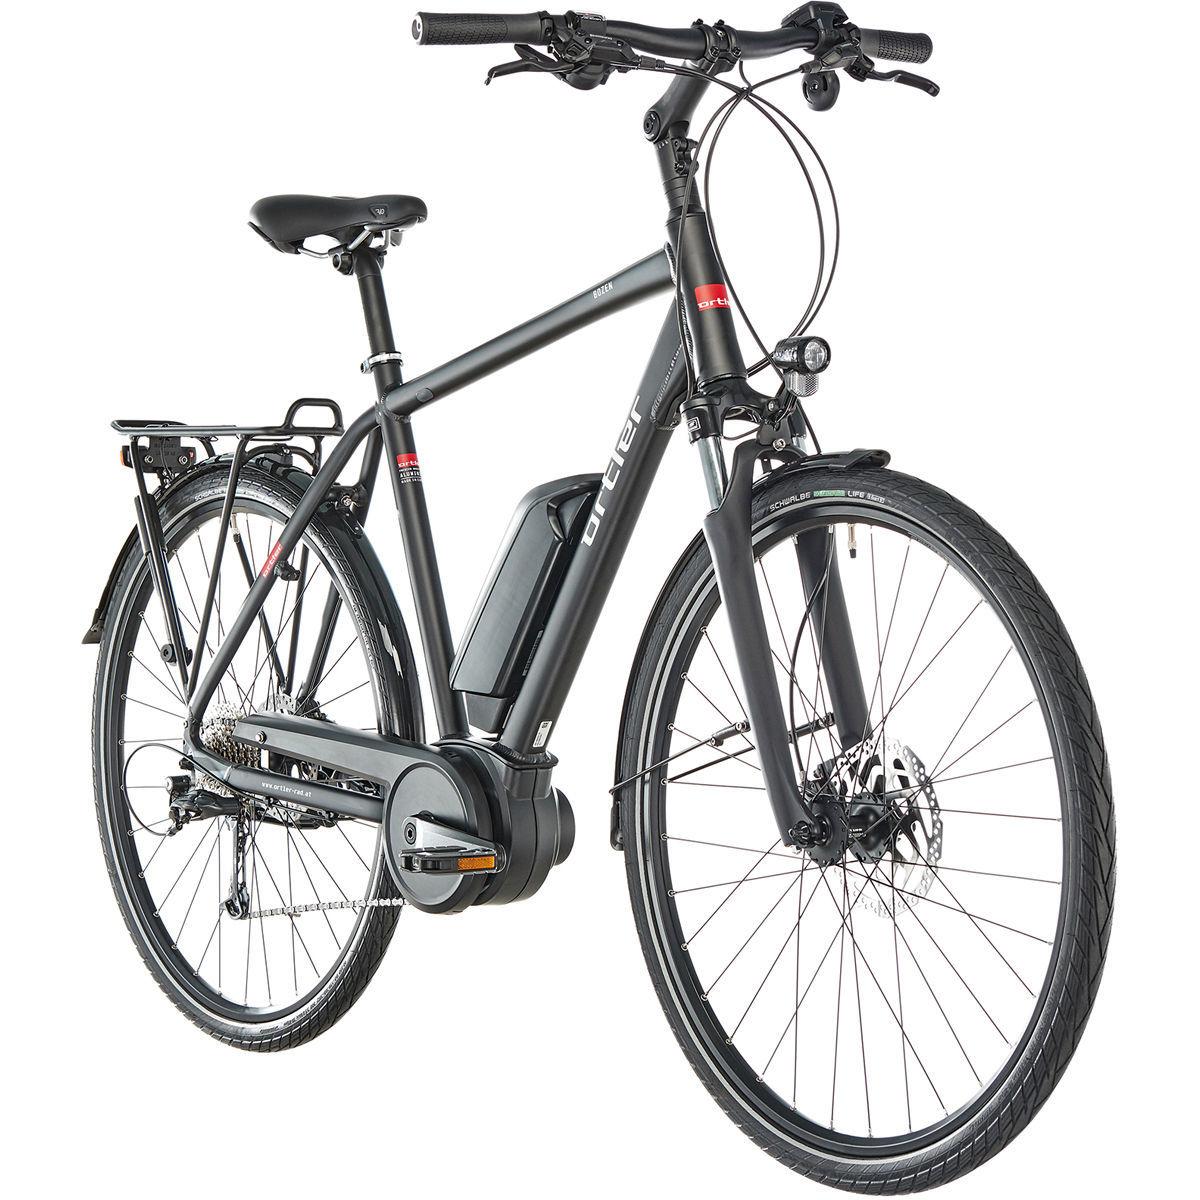 ortler bozen e bike f r 799 ausverkauft auch andere fahrr der im angebot. Black Bedroom Furniture Sets. Home Design Ideas